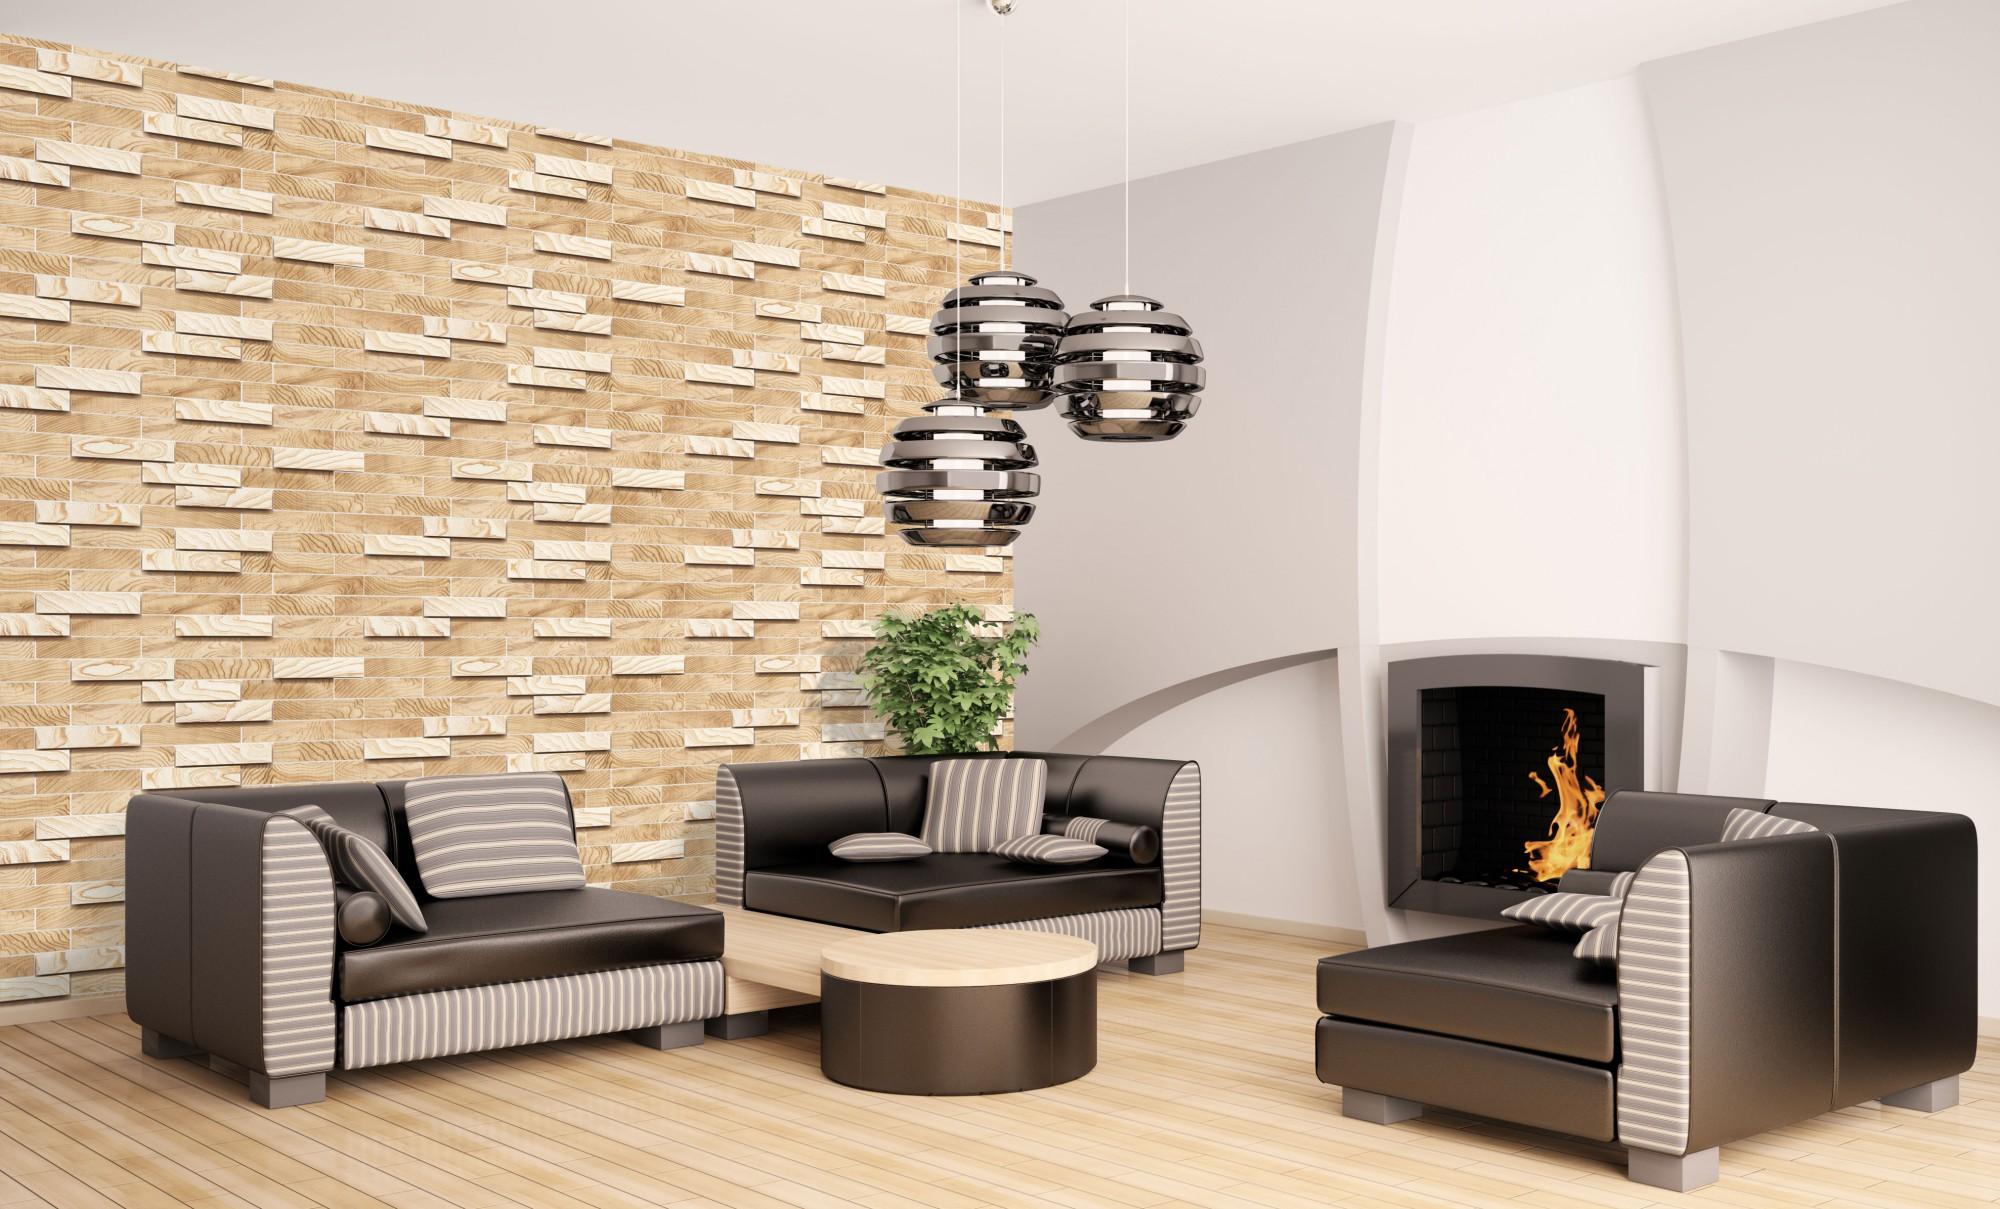 1 pvc dekorplatte mosaic wandverkleidung platten wand 98x48cm alder dekore aus pvc dekorplatten. Black Bedroom Furniture Sets. Home Design Ideas